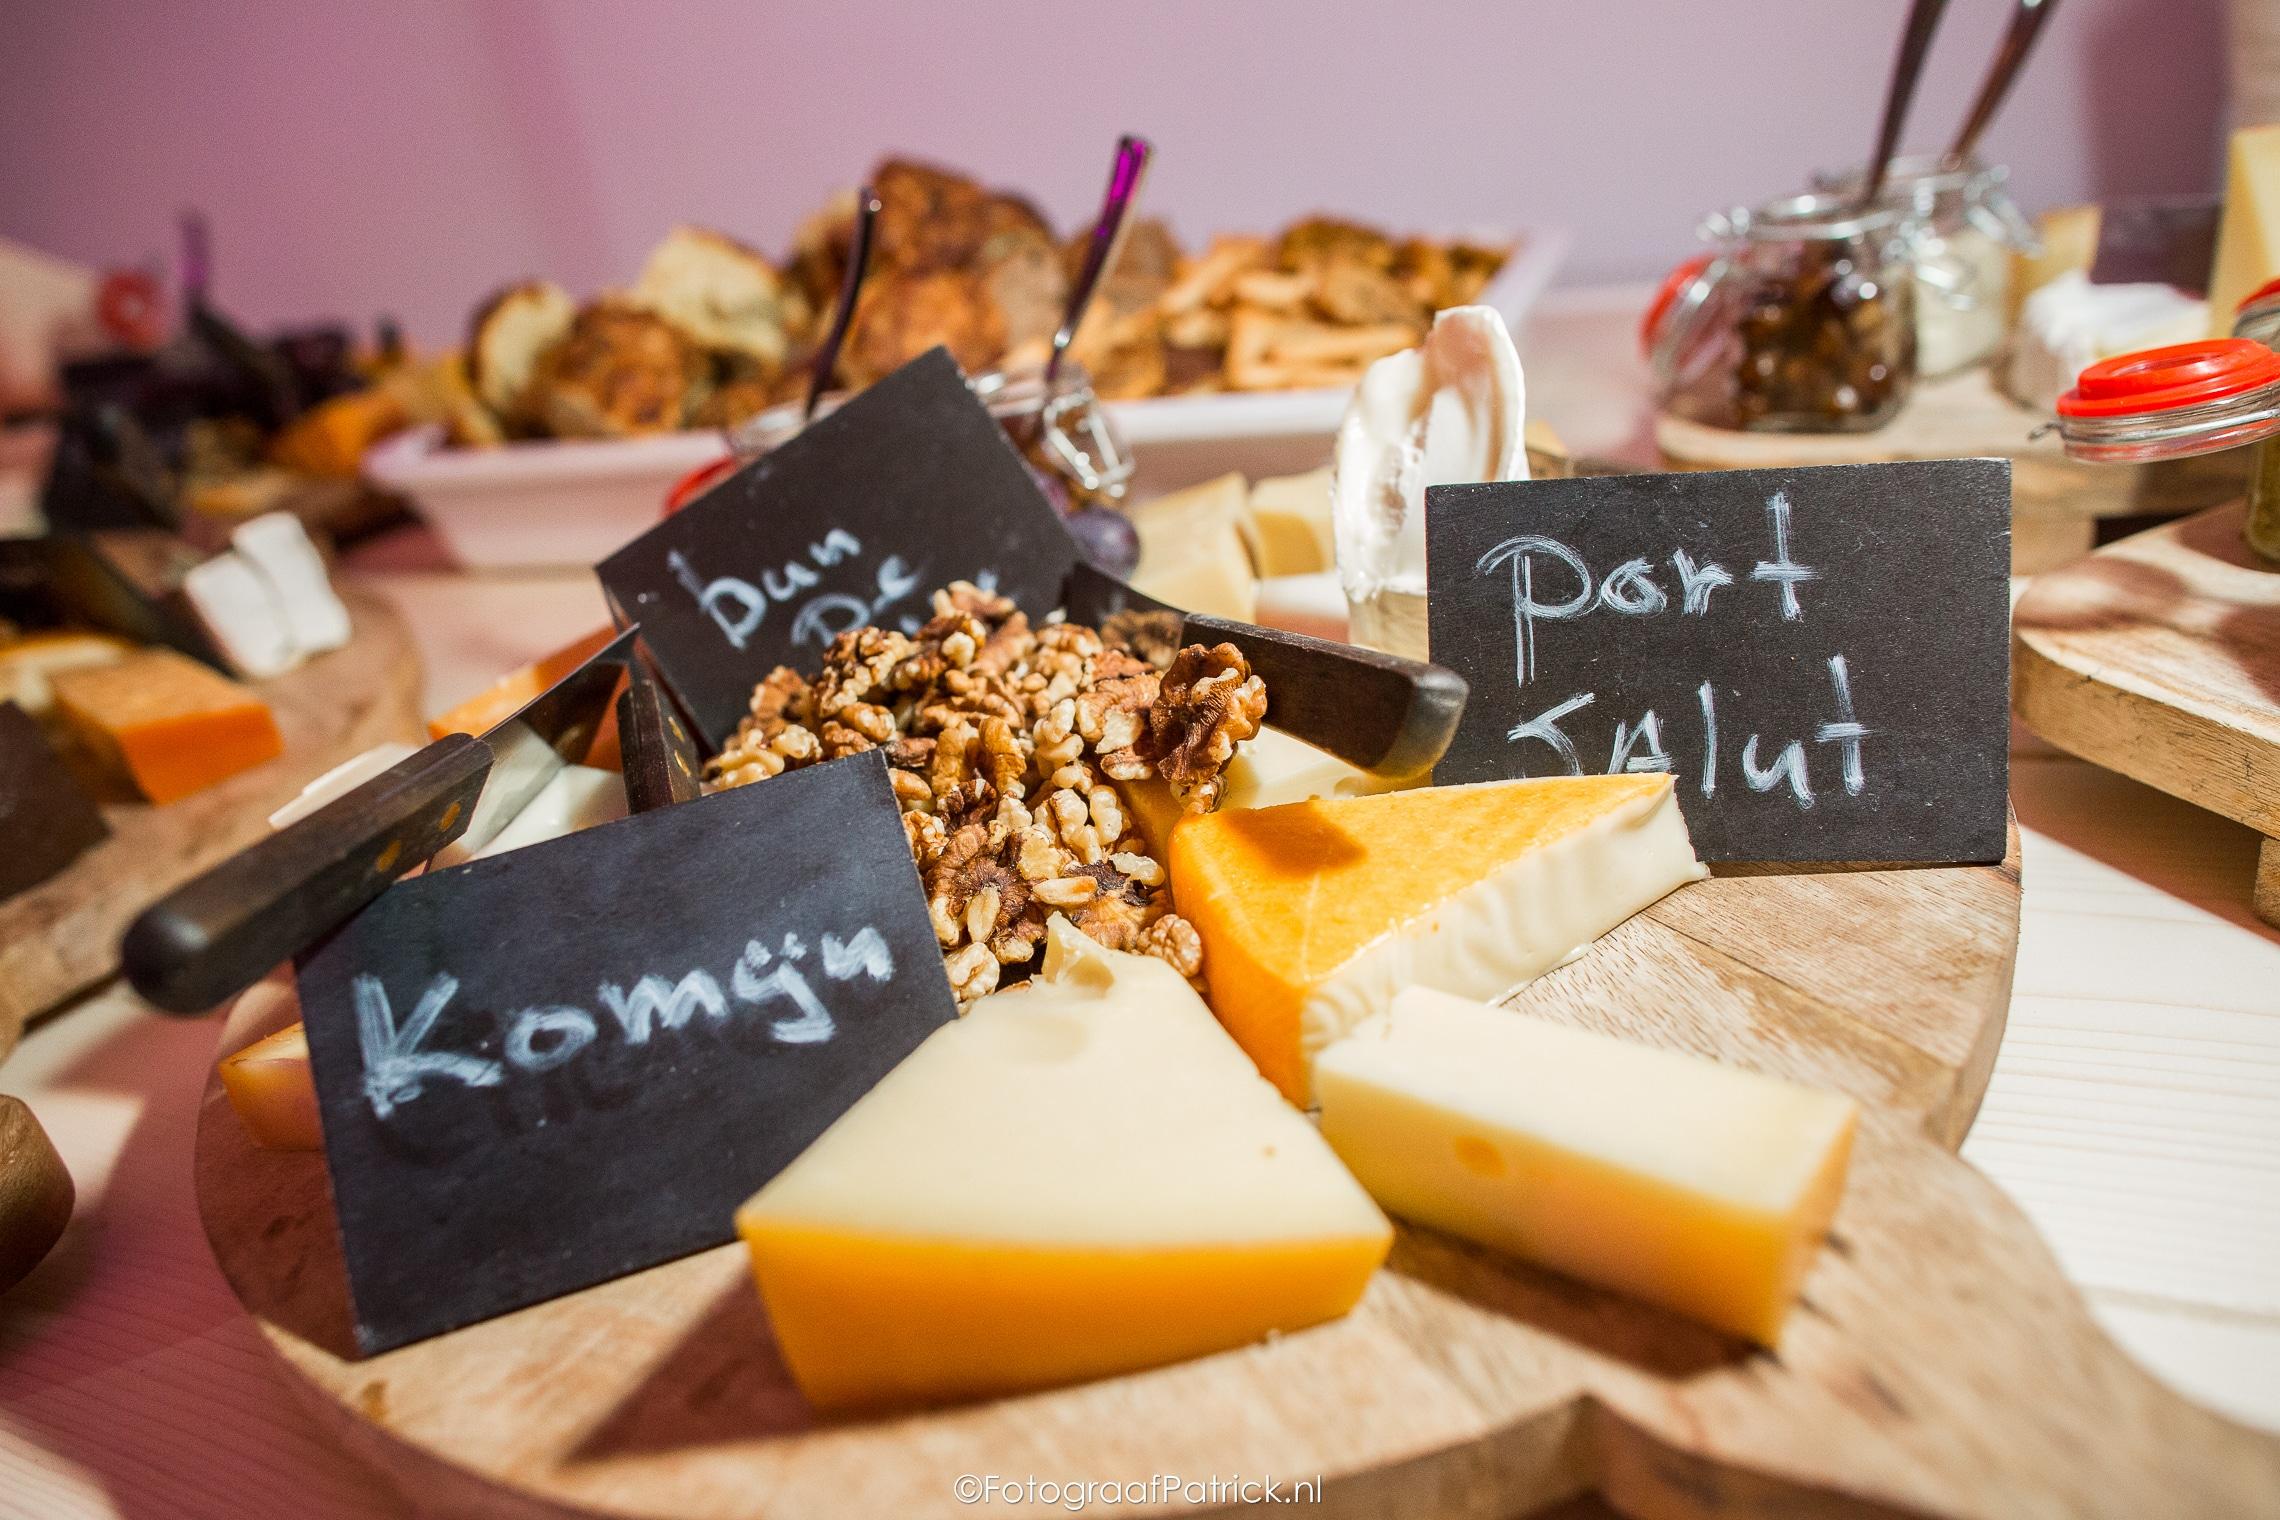 Buffet-catering-badhoevedorp-aelsmeer-catering-en-events